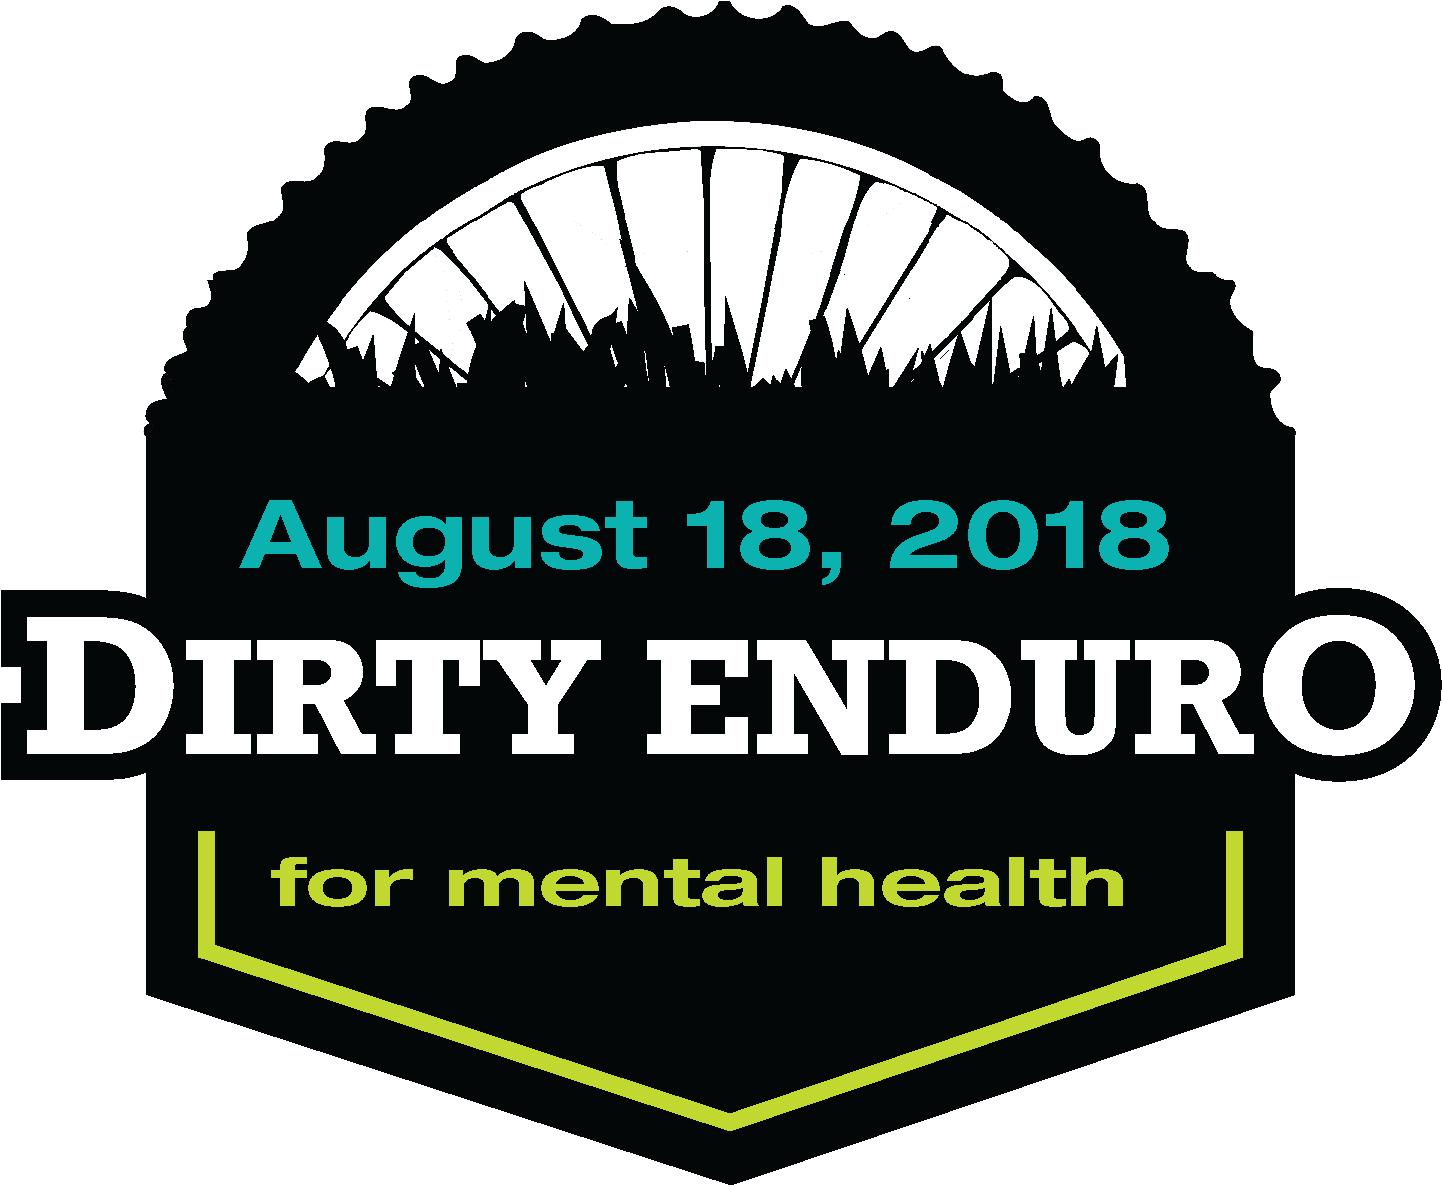 Dirty Enduro logo